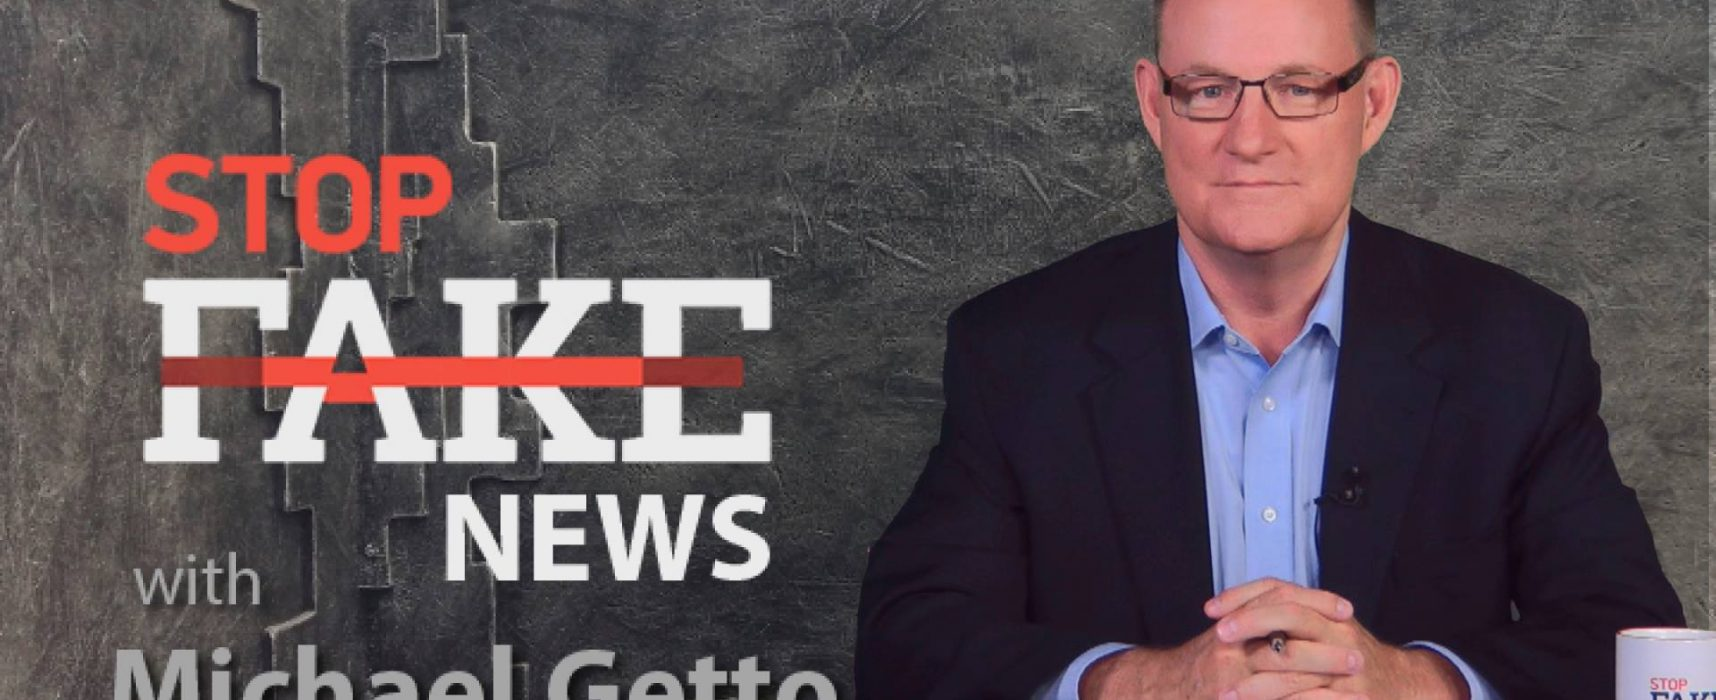 StopFakeNews #94 with Michael Getto